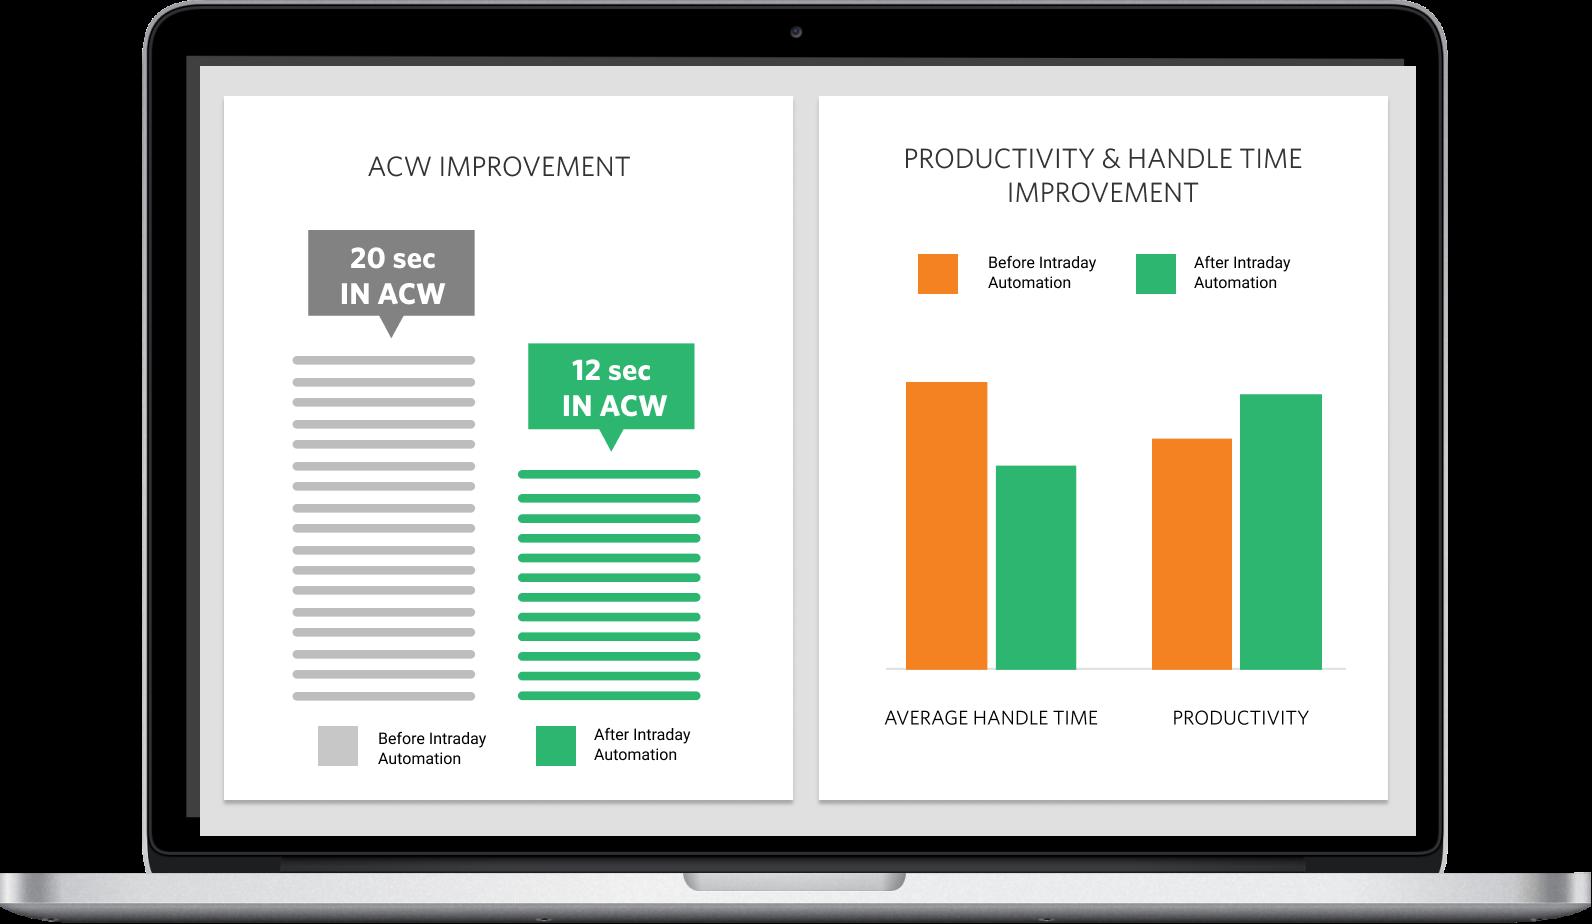 ACW, Productivity, and Handle time improvement bar graoh